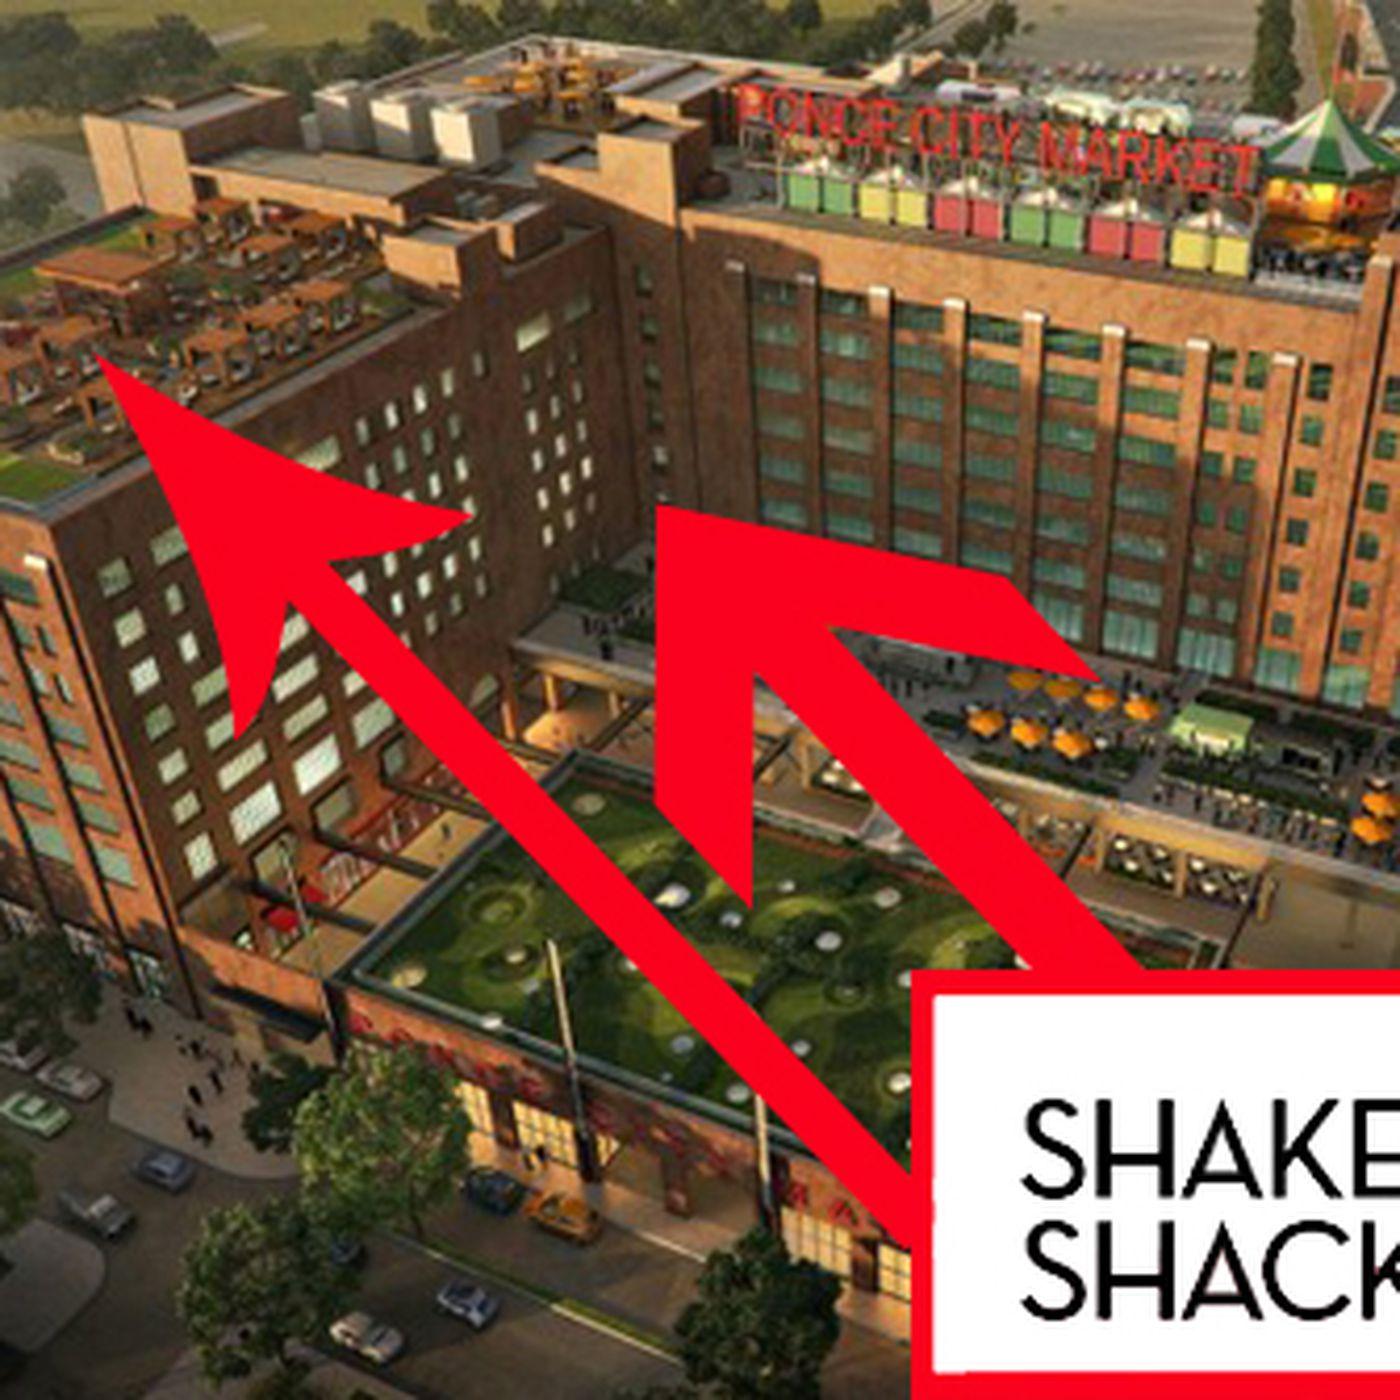 Will Atlanta Get Not One but Two Shake Shacks? - Eater Atlanta